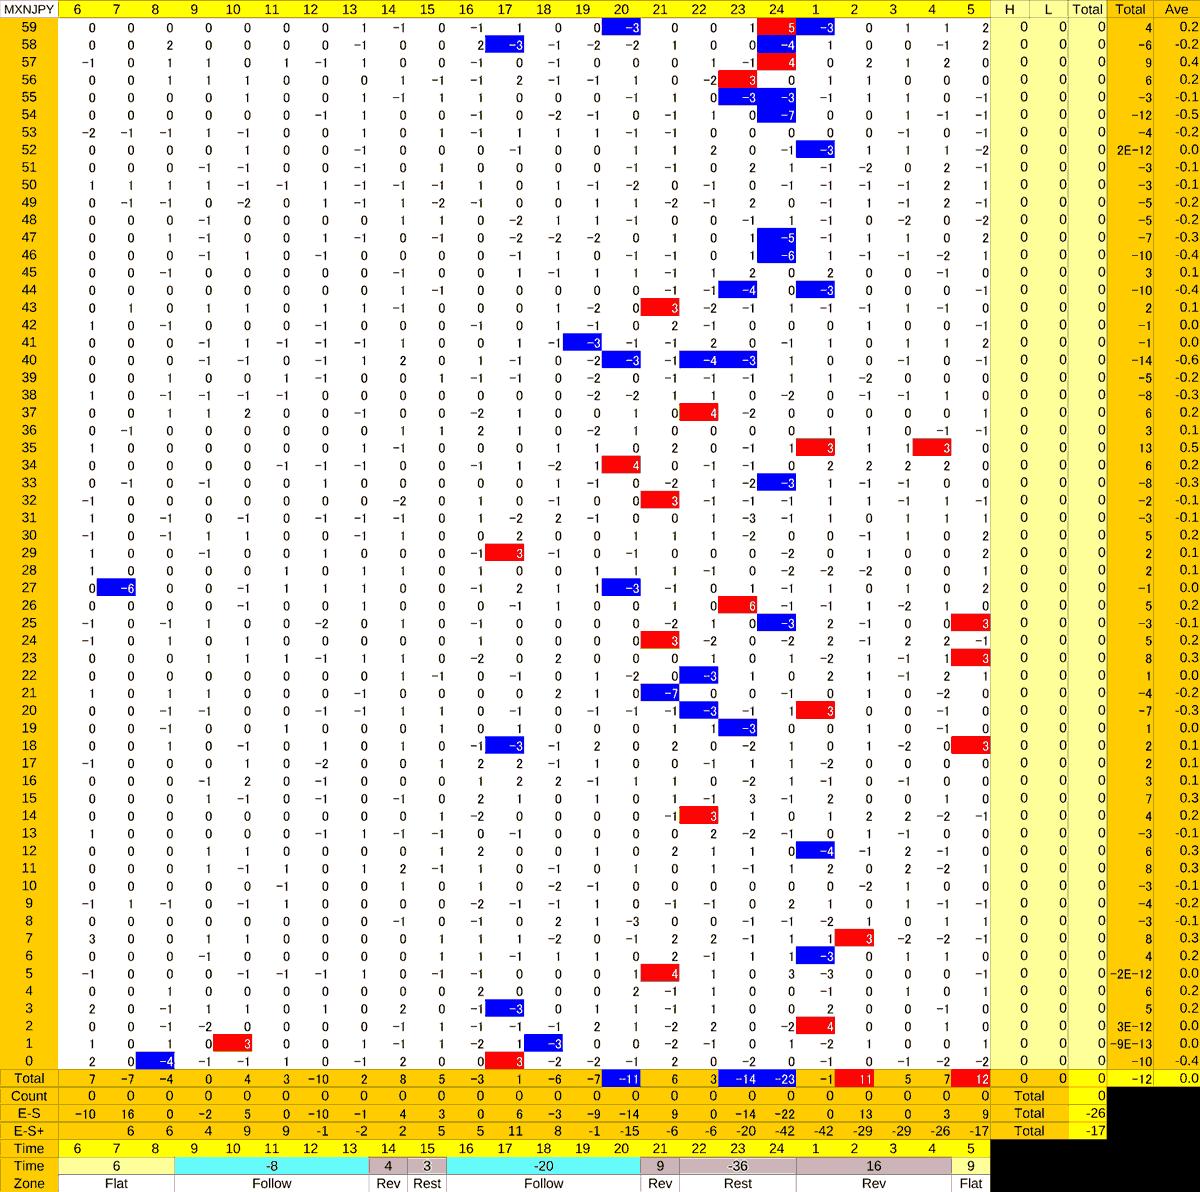 20210204_HS(3)MXNJPY